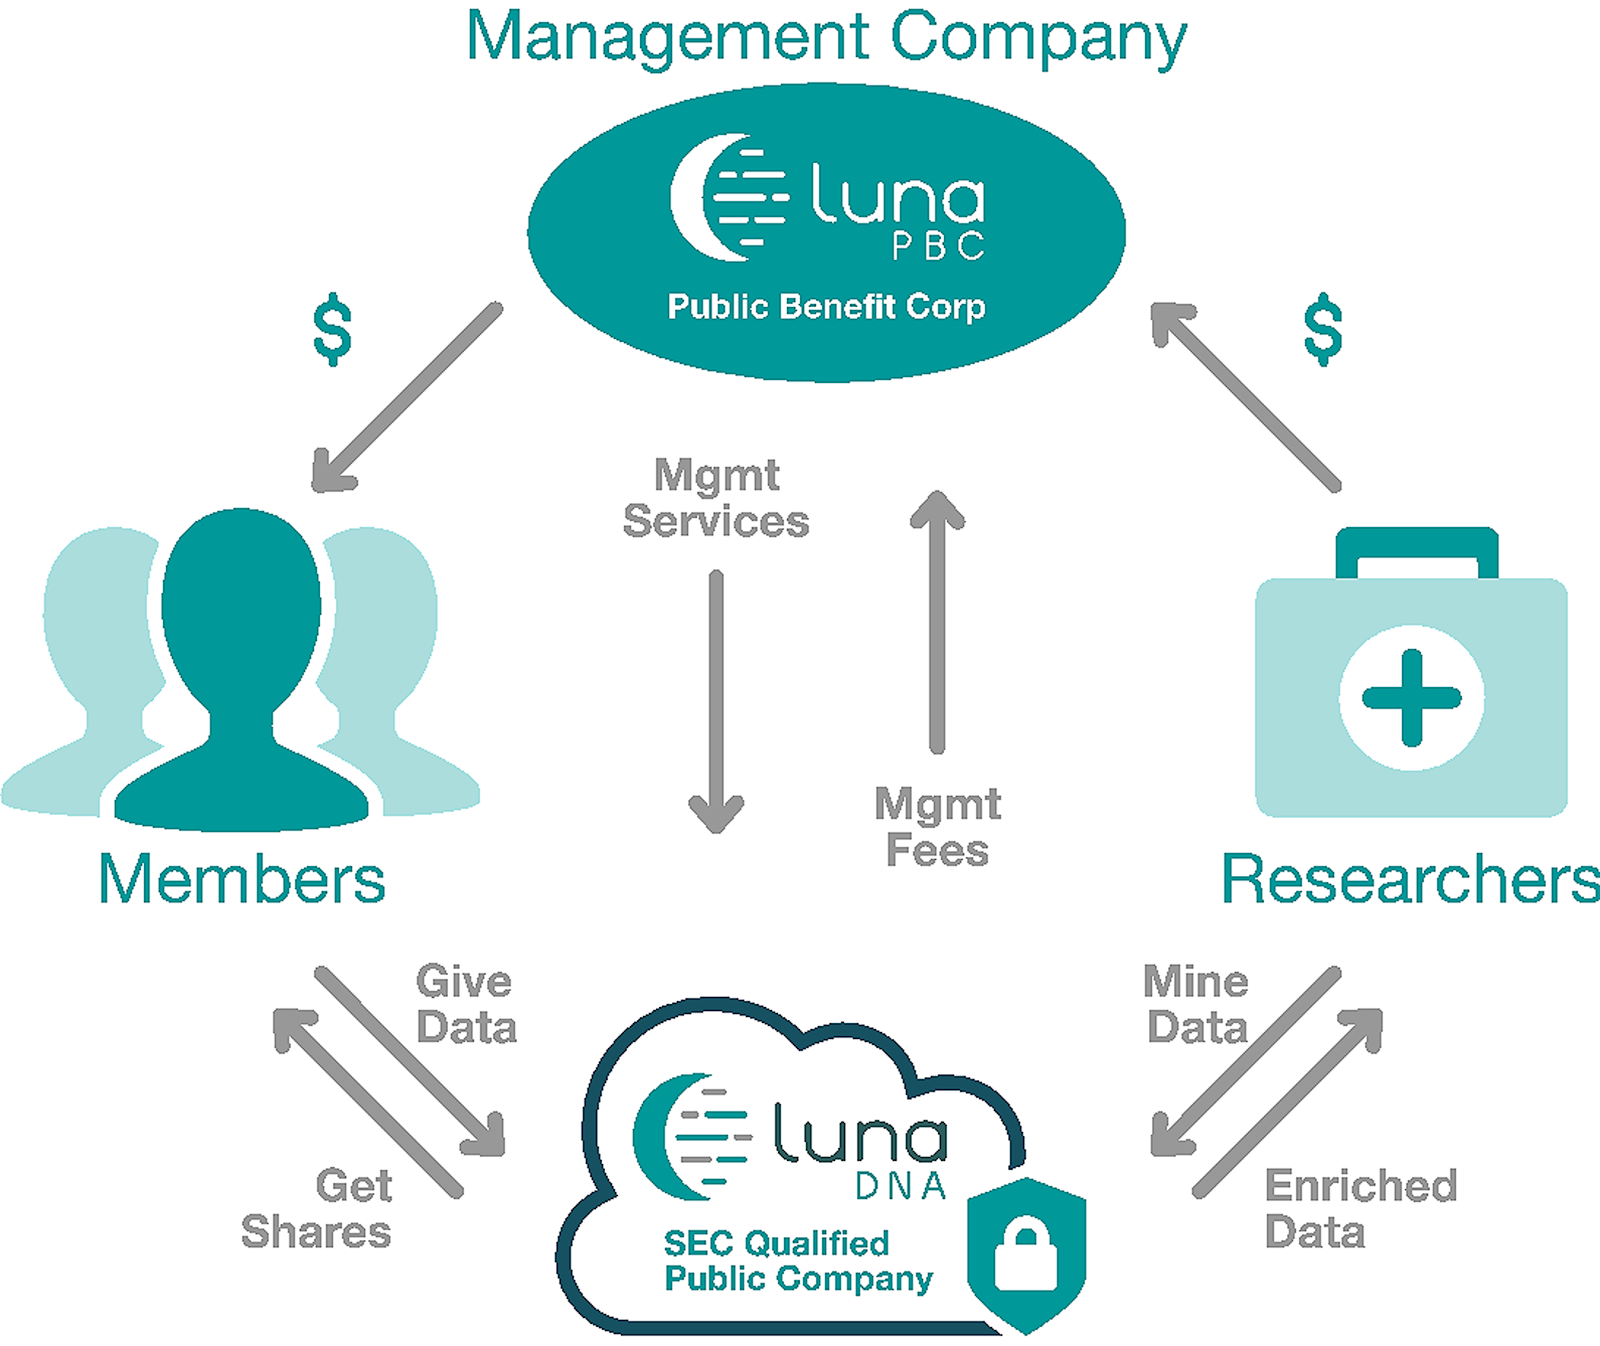 LunaDNAデータ共有モデル。